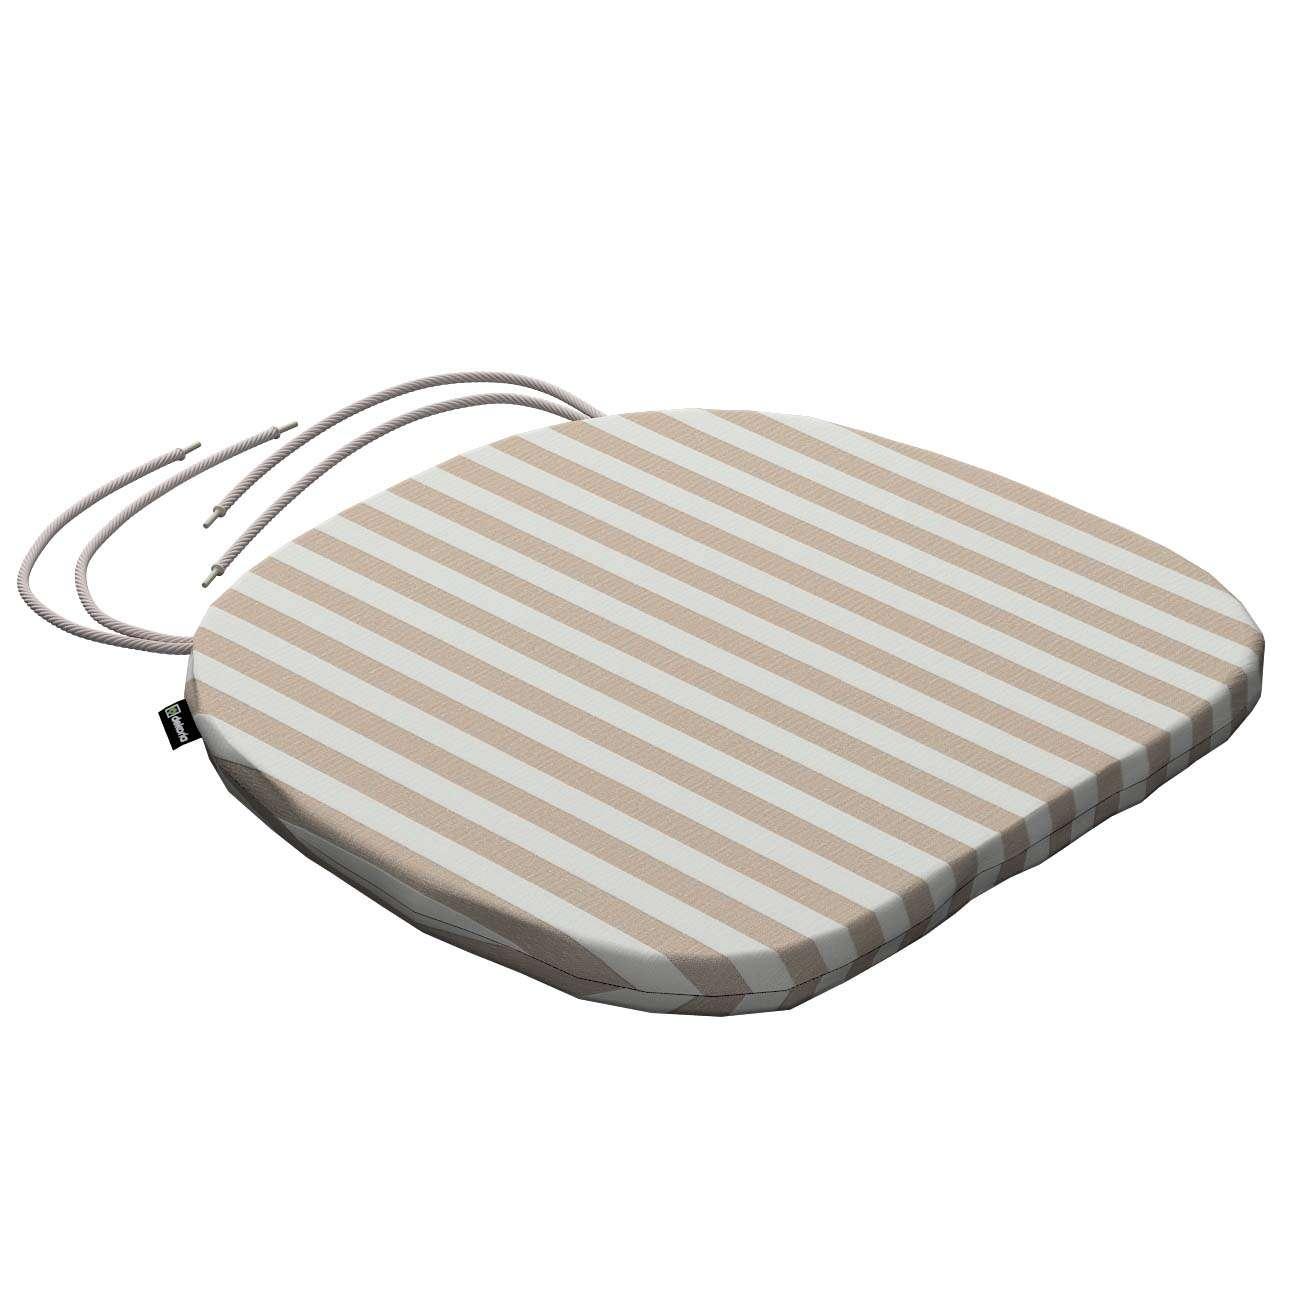 Kėdės pagalvėlė Bartek  40 x 37 x 2,5 cm kolekcijoje Quadro, audinys: 136-07